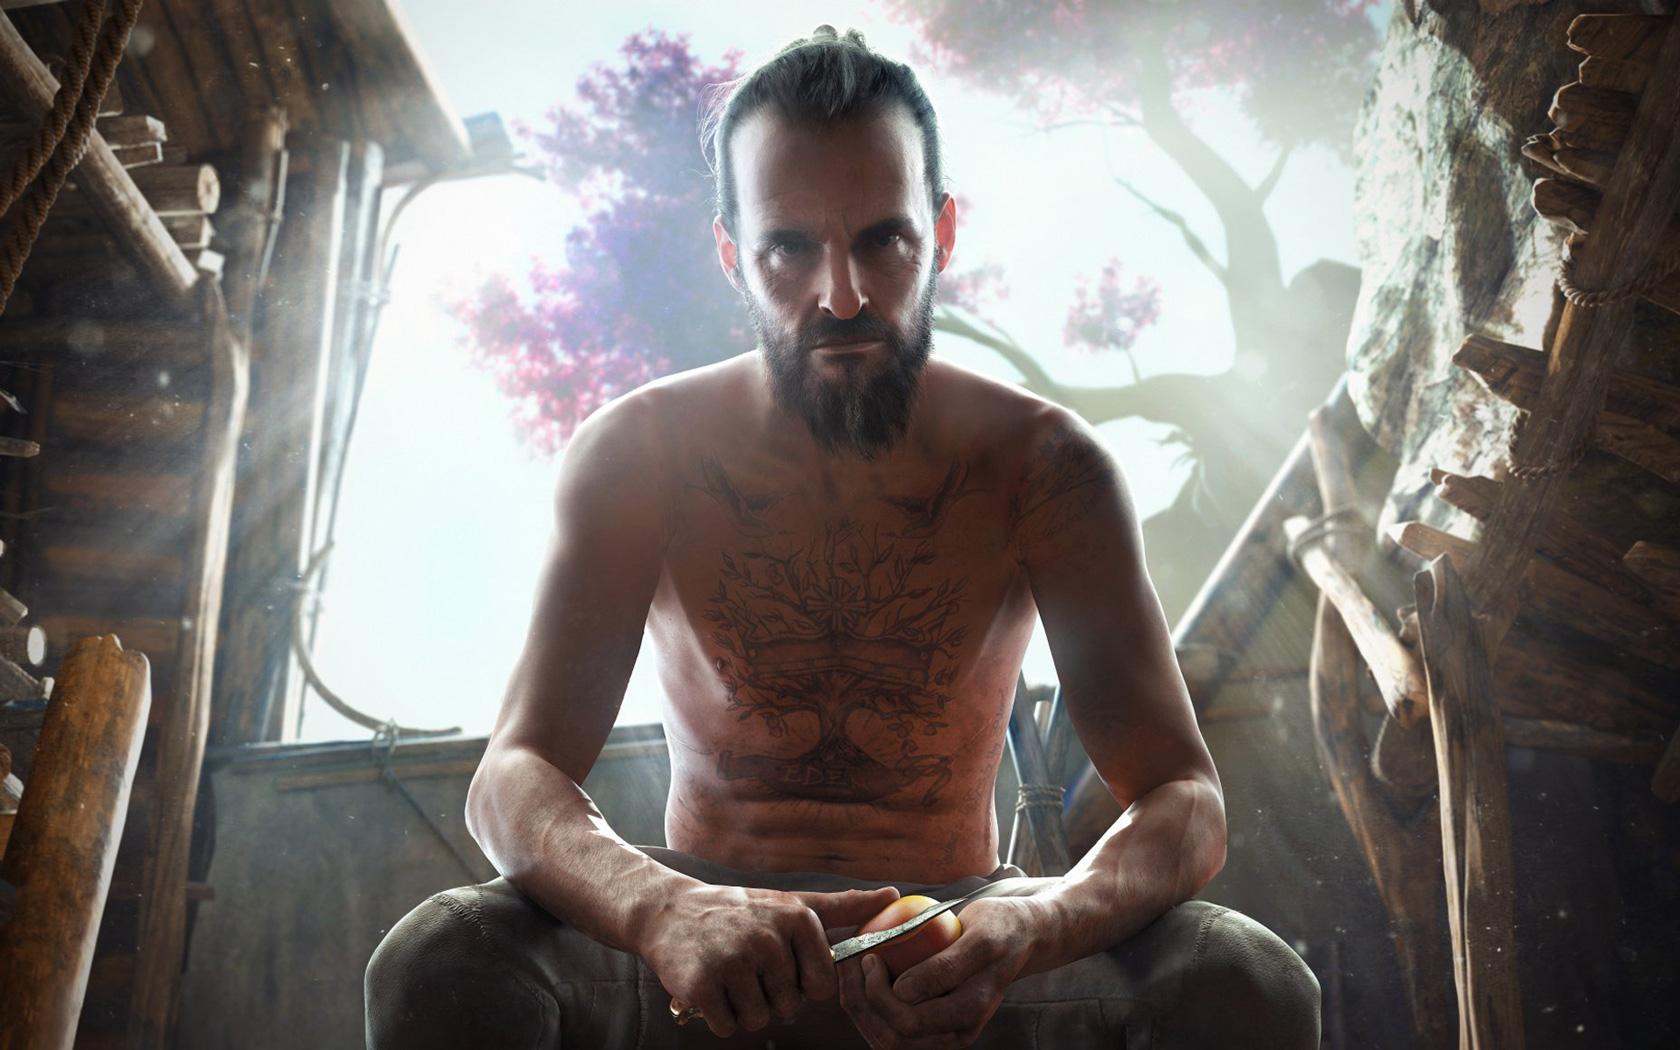 Far Cry: New Dawn Wallpaper in 1680x1050